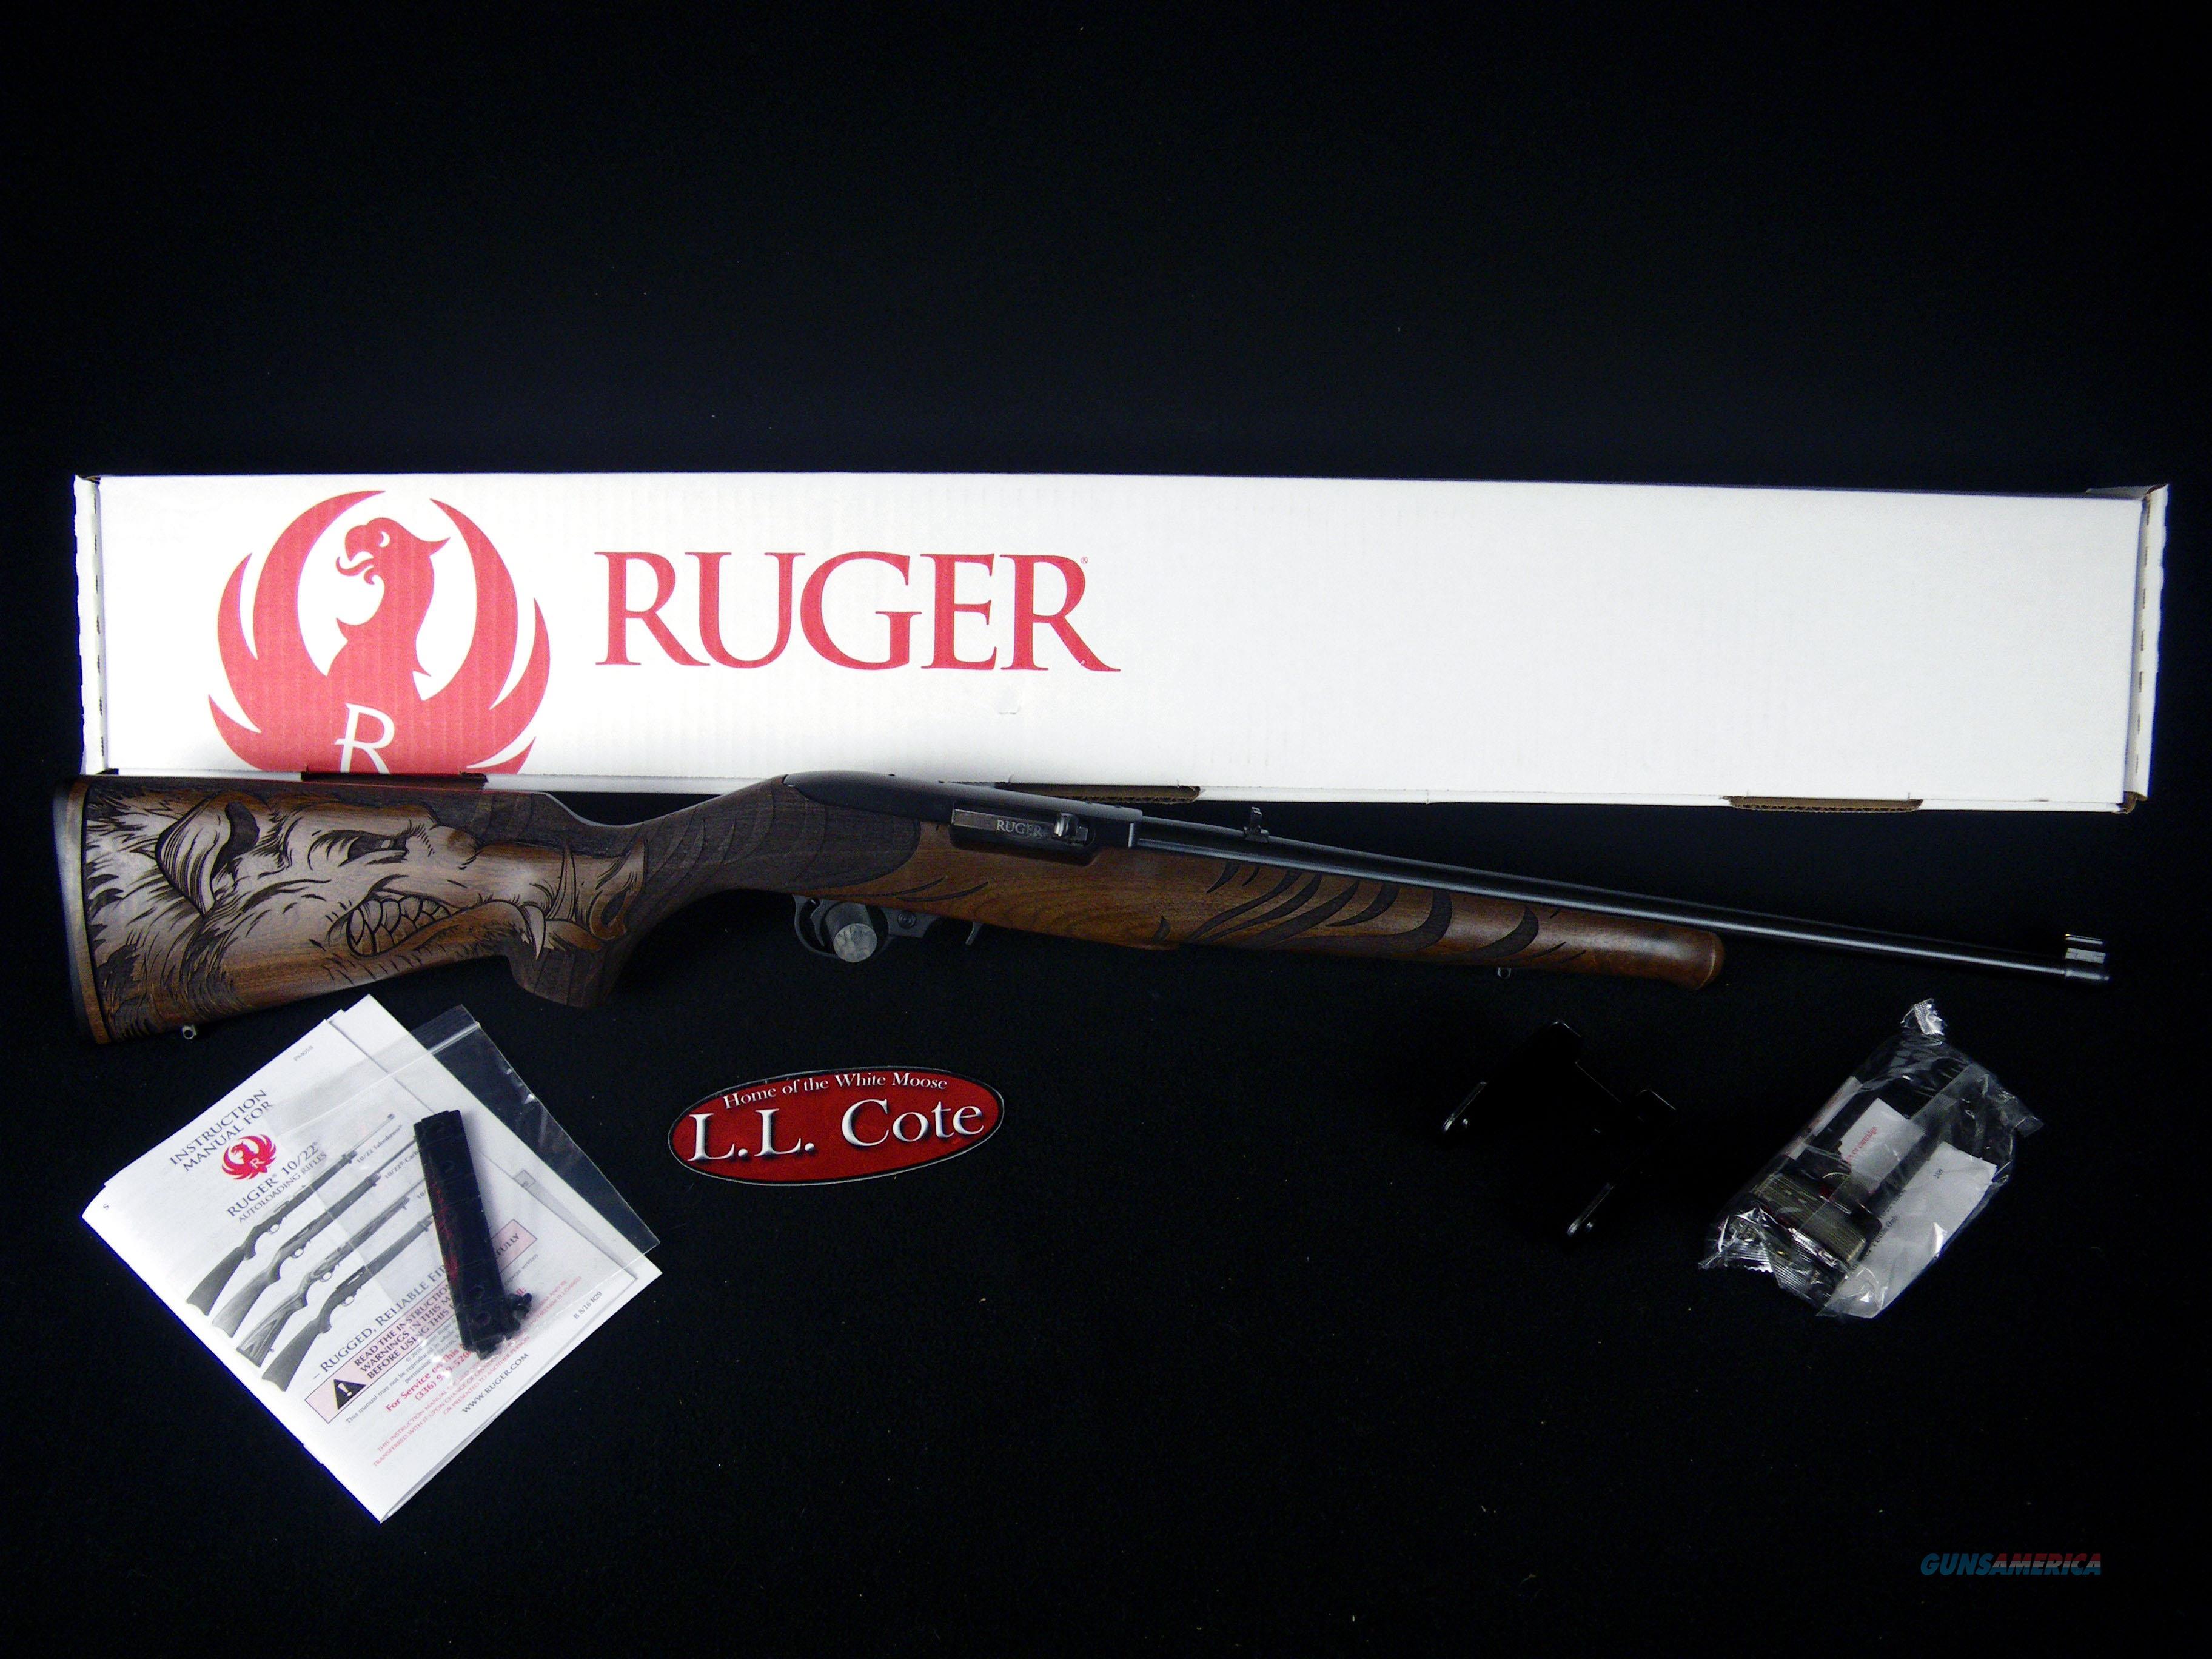 "Ruger 10/22 Sporter Wild Hog 22lr 18.5"" NEW 21168  Guns > Rifles > Ruger Rifles > 10-22"